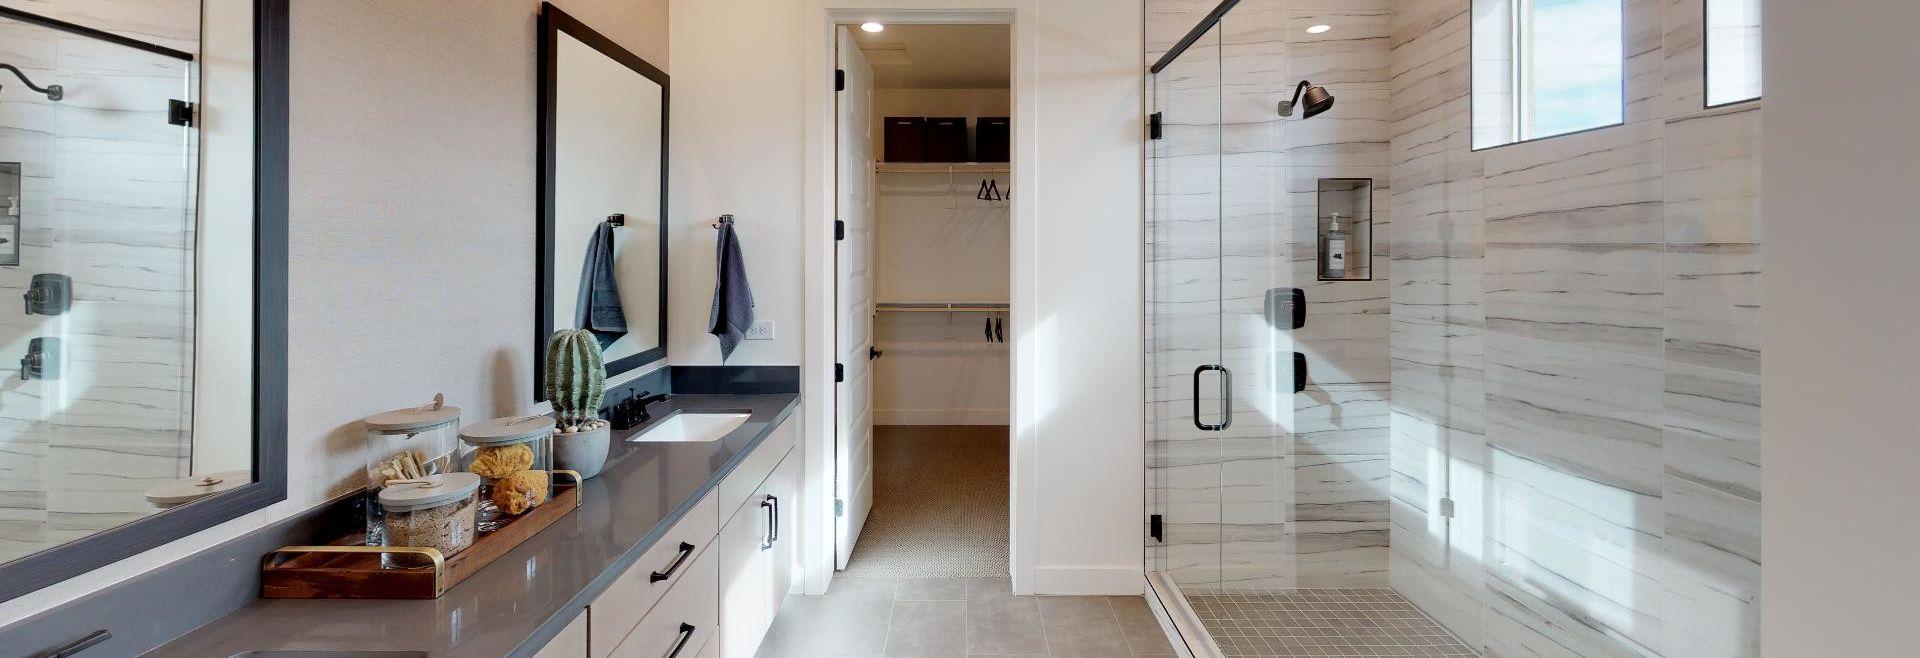 Plan 4024 Master Bath